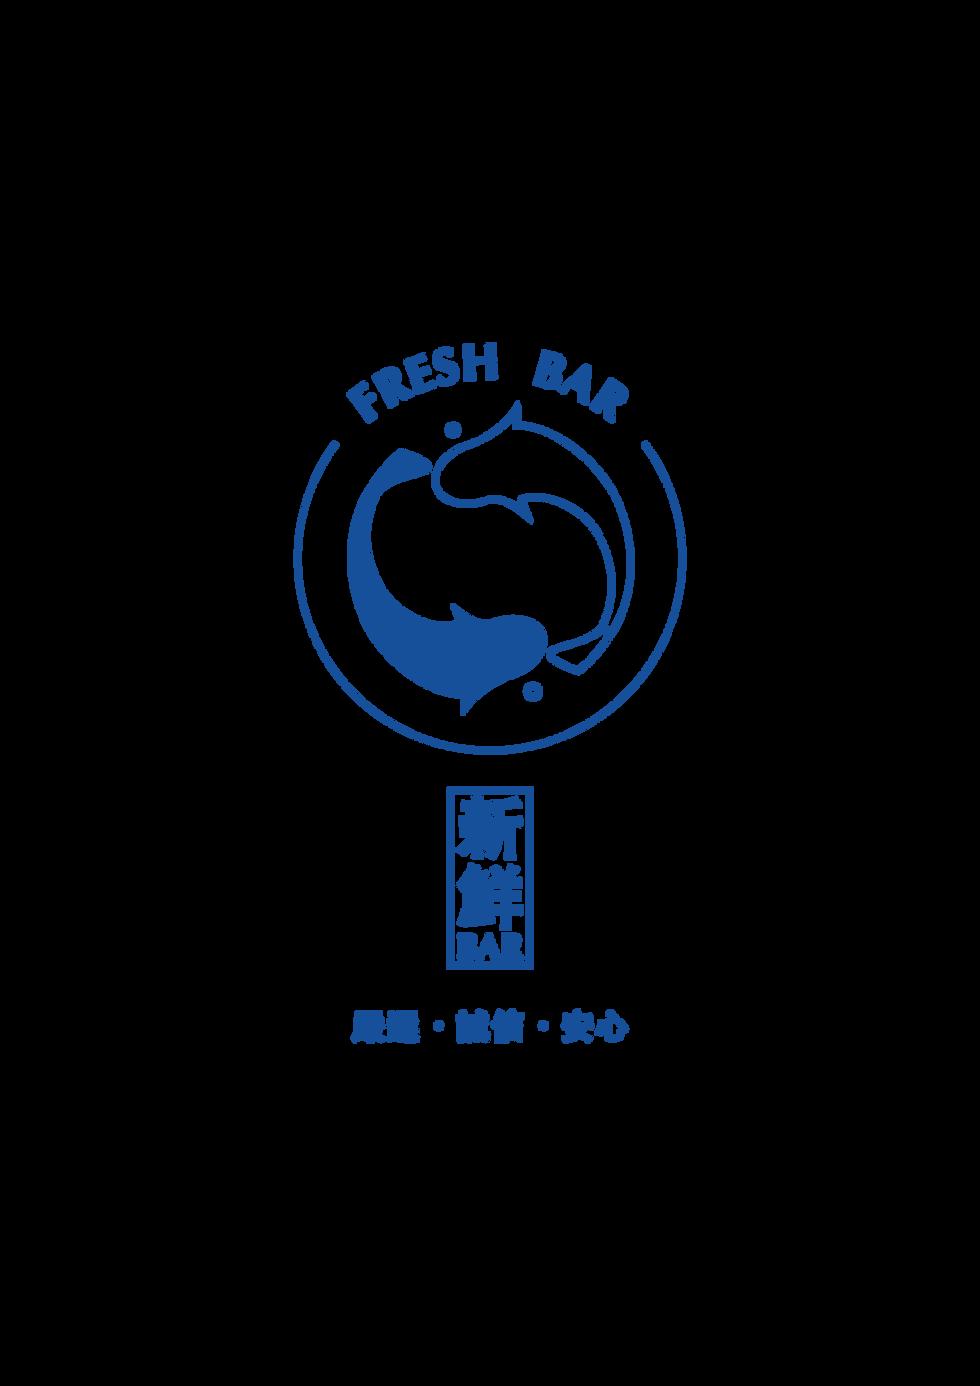 Fresh Bar 完稿-01.png